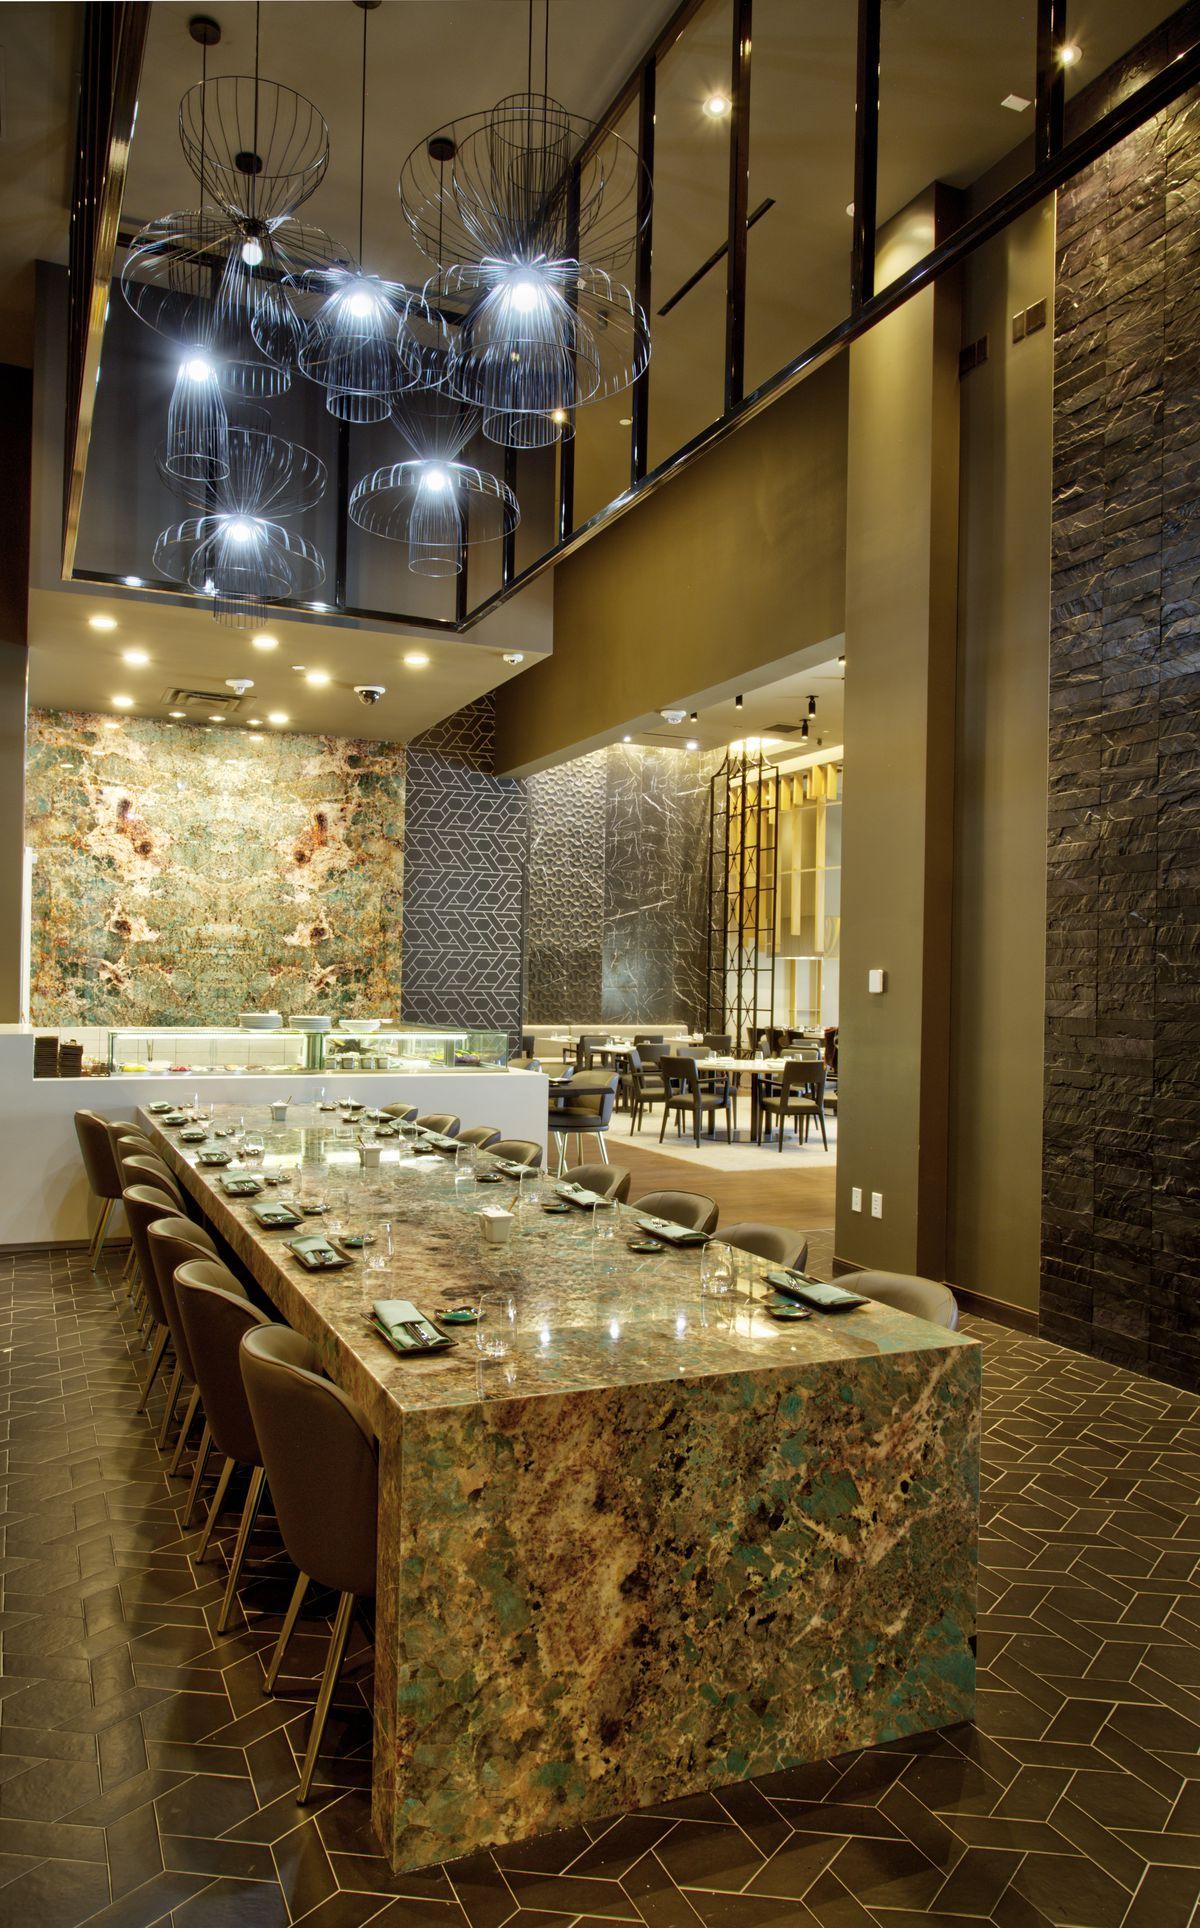 Jade Opens At The Jw Marriott In June Eater Vegas